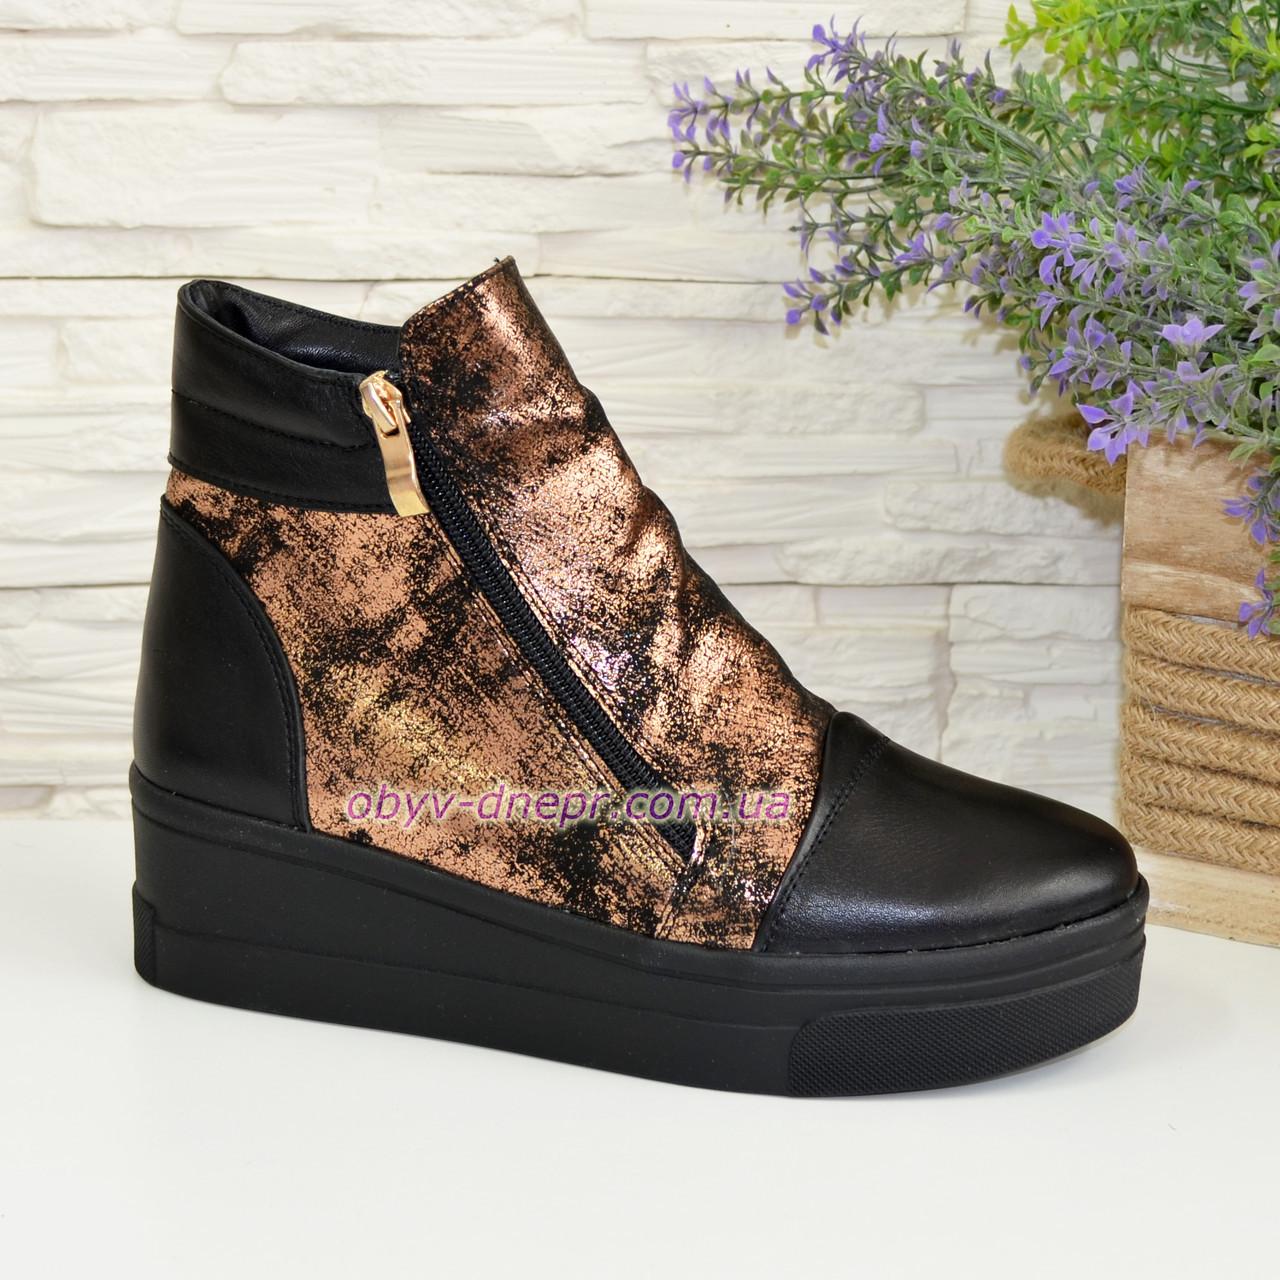 Женские демисезонные ботинки на платформе. 37 размер, фото 1